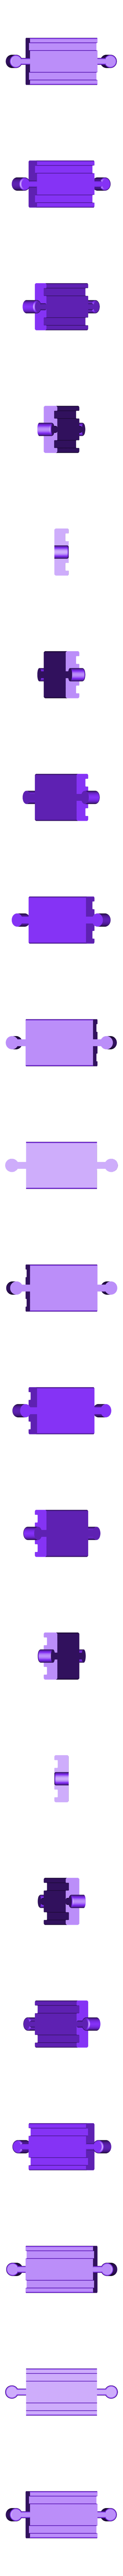 Male to Male Track.stl Download free STL file Toy Train Tracks • 3D printer design, FerryTeacher